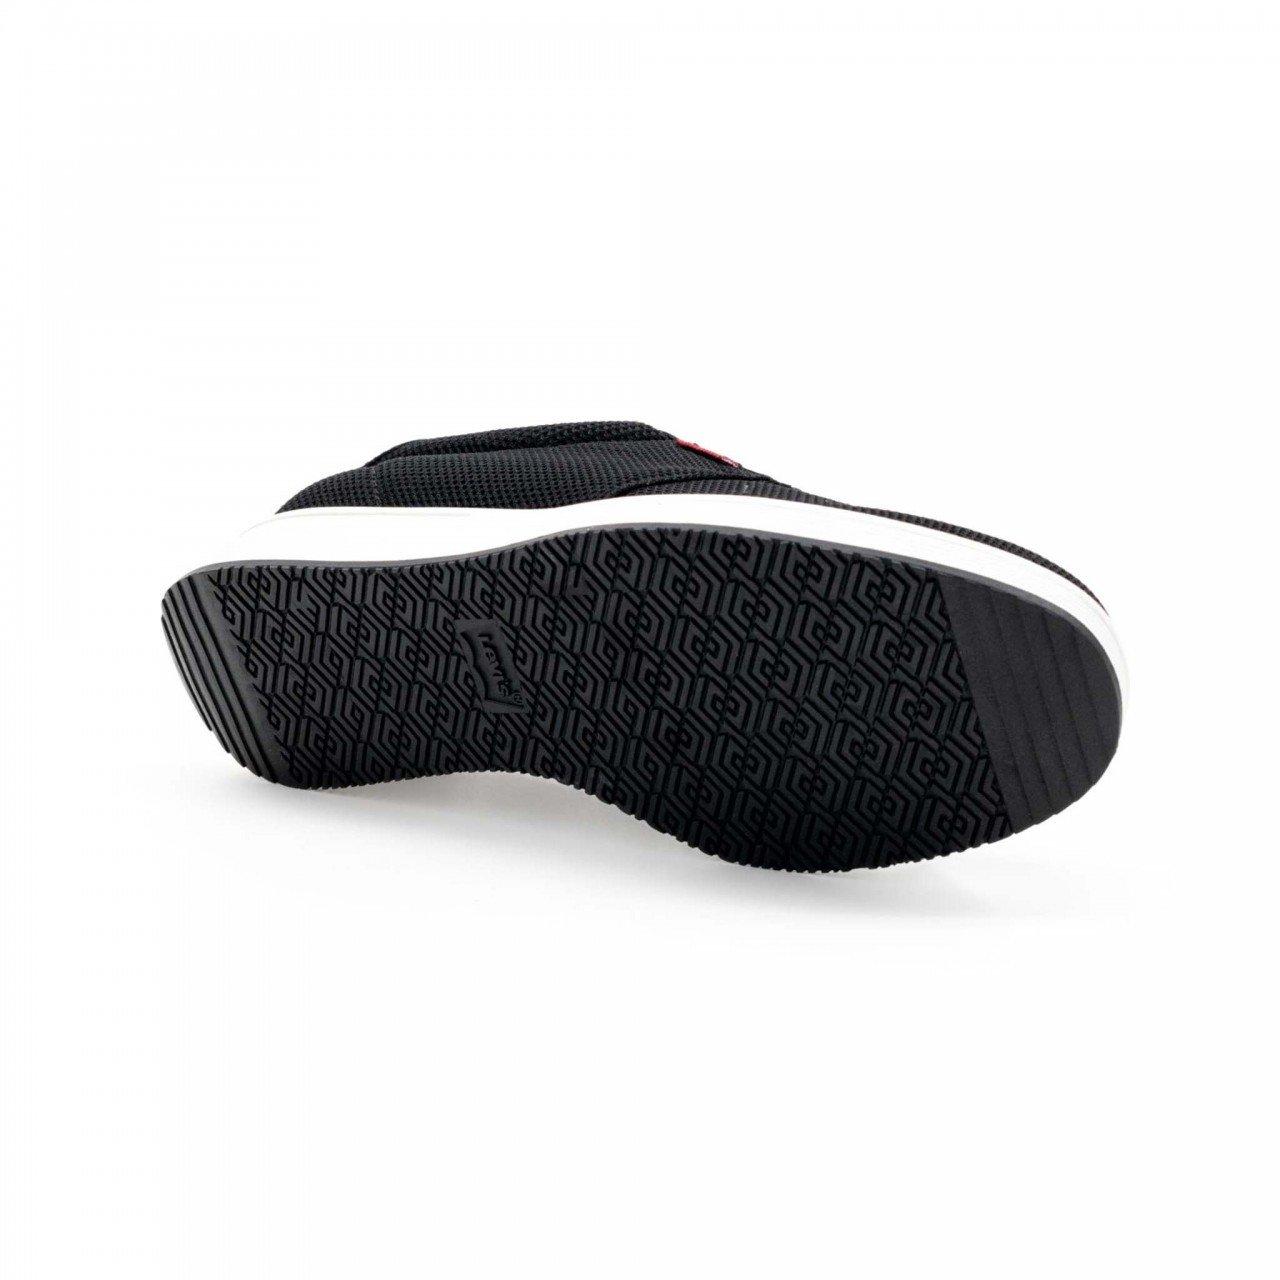 Tenis negro textil para mujer Levis 111281